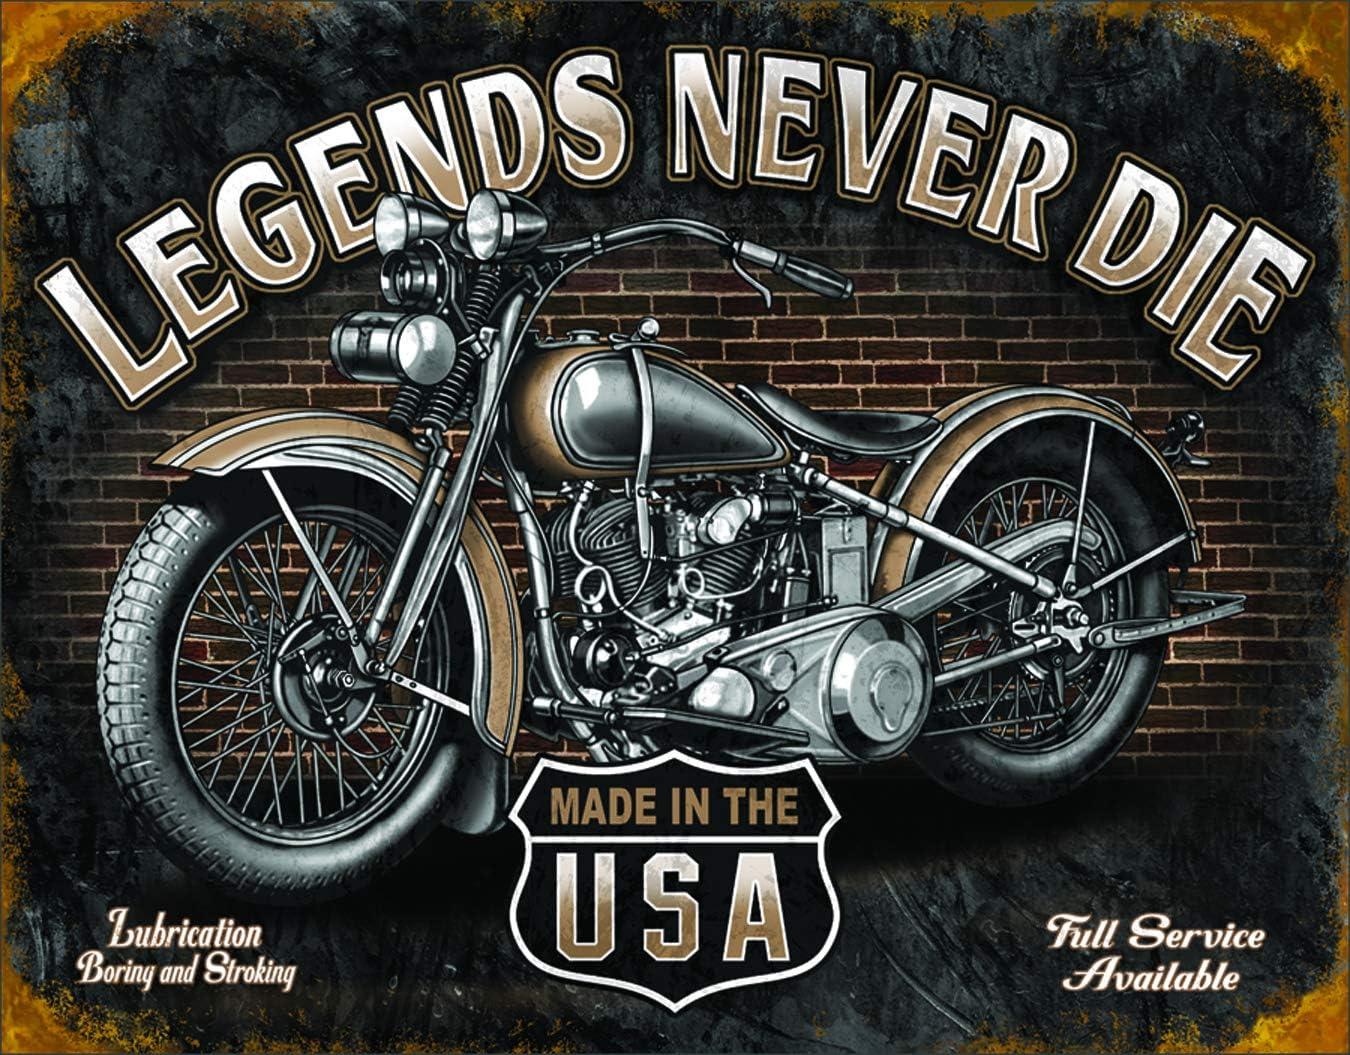 Desperate Enterprises Legends Never Die Biker Tin Sign Flat New 31X40cm S2177